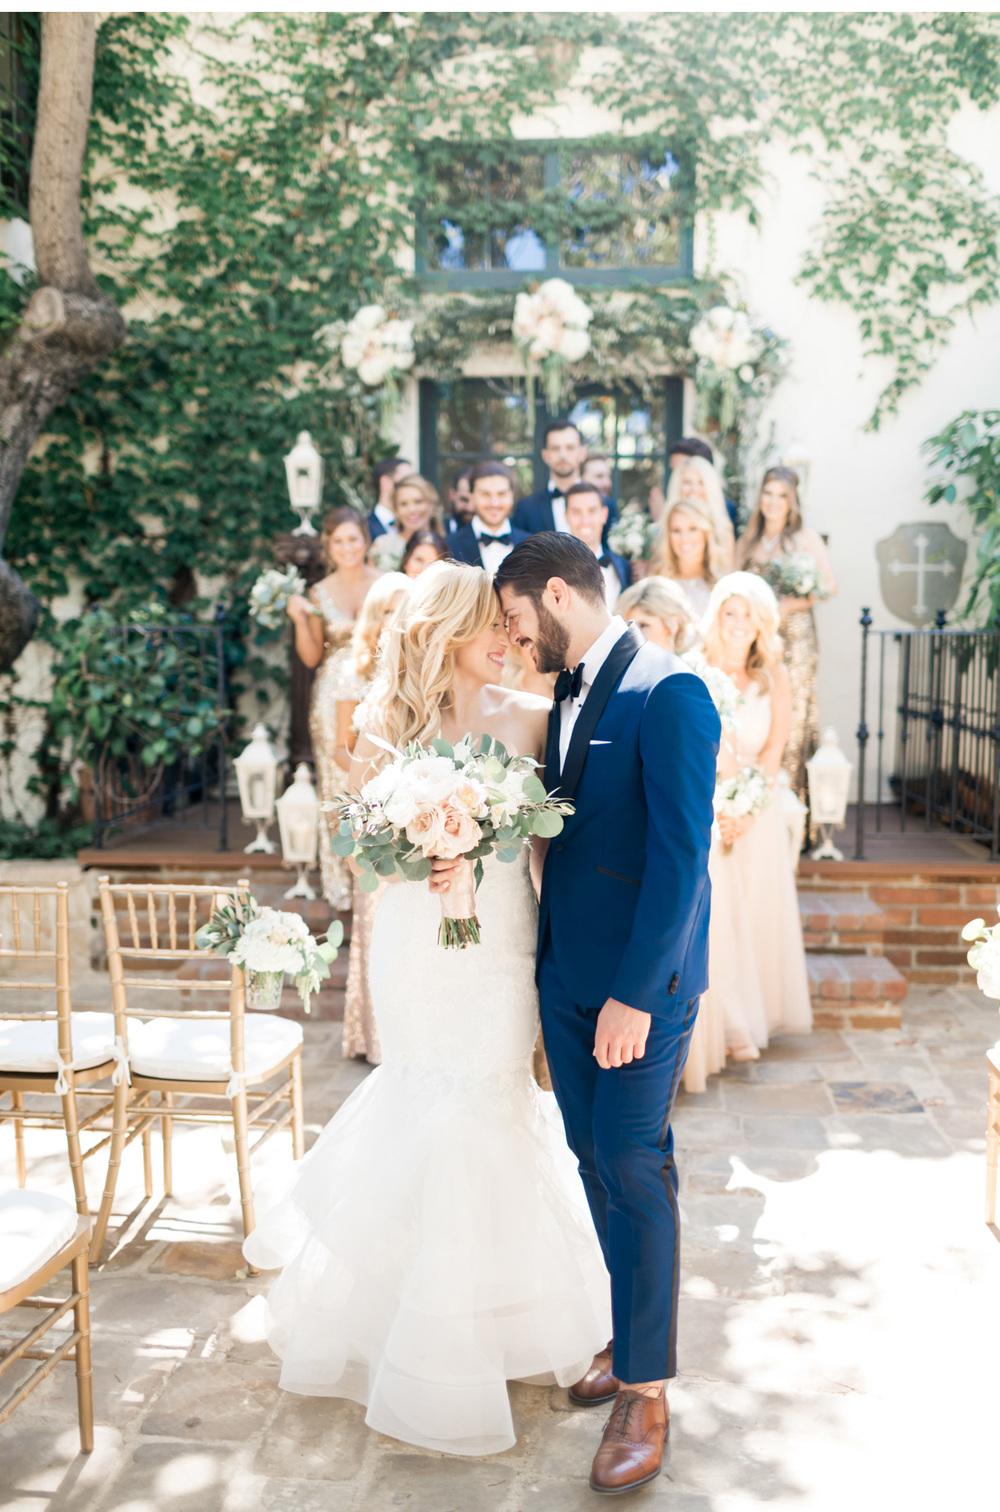 Style-Me-Pretty-Mission-San-Juan-Capistrano-Wedding-Natalie-Schutt-Photography_01.jpg